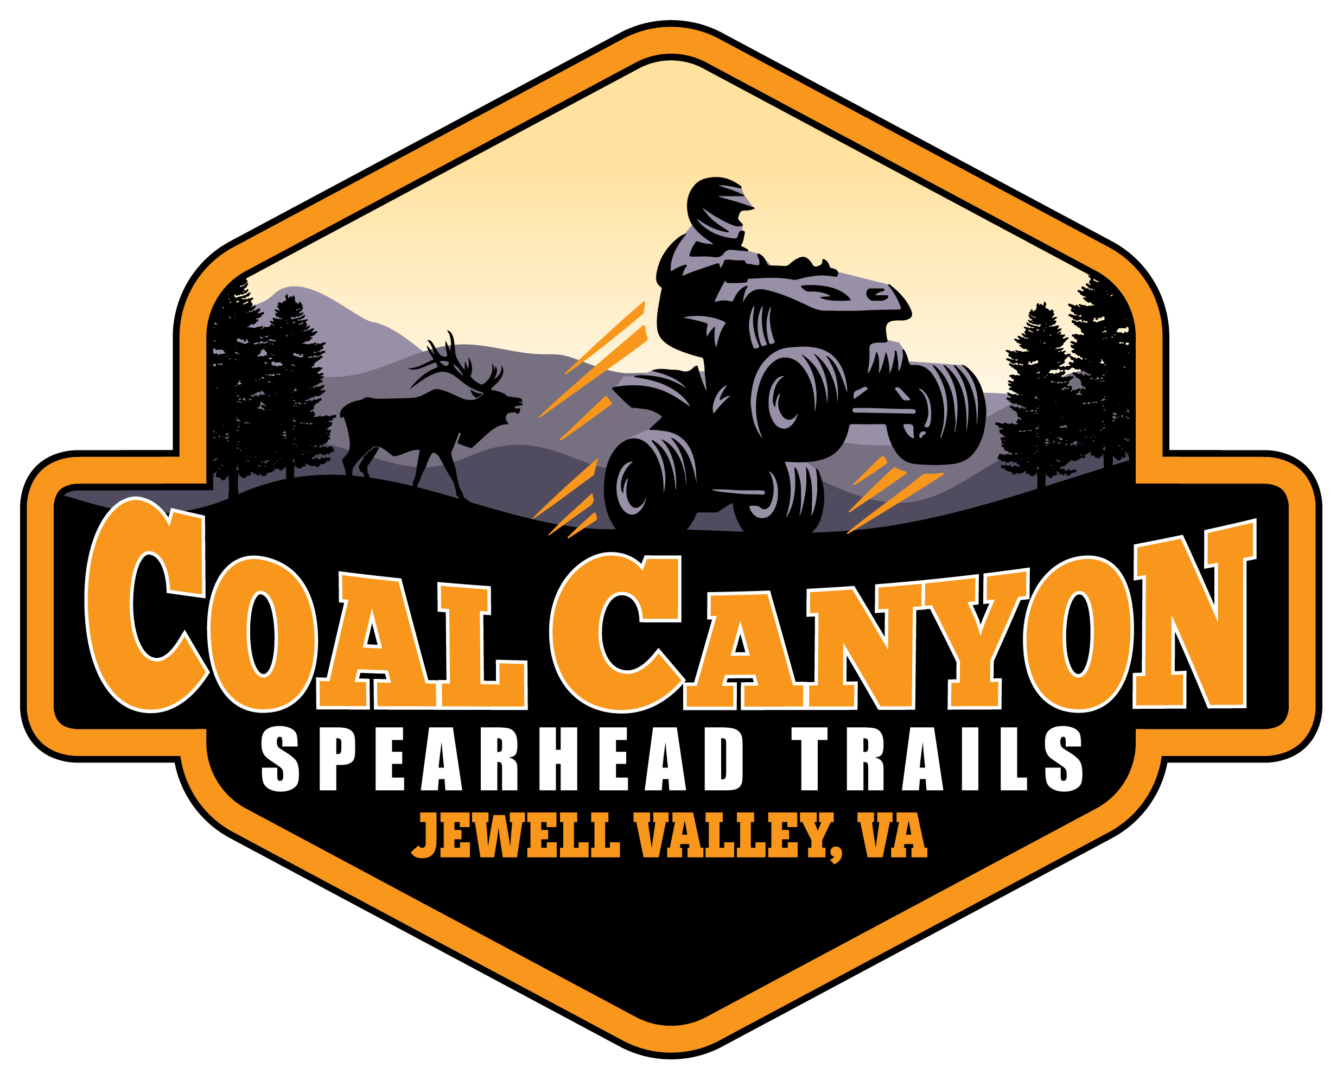 https://secureservercdn.net/198.71.233.199/798.e5e.myftpupload.com/wp-content/uploads/2020/07/new-coal-canyon-JV.png